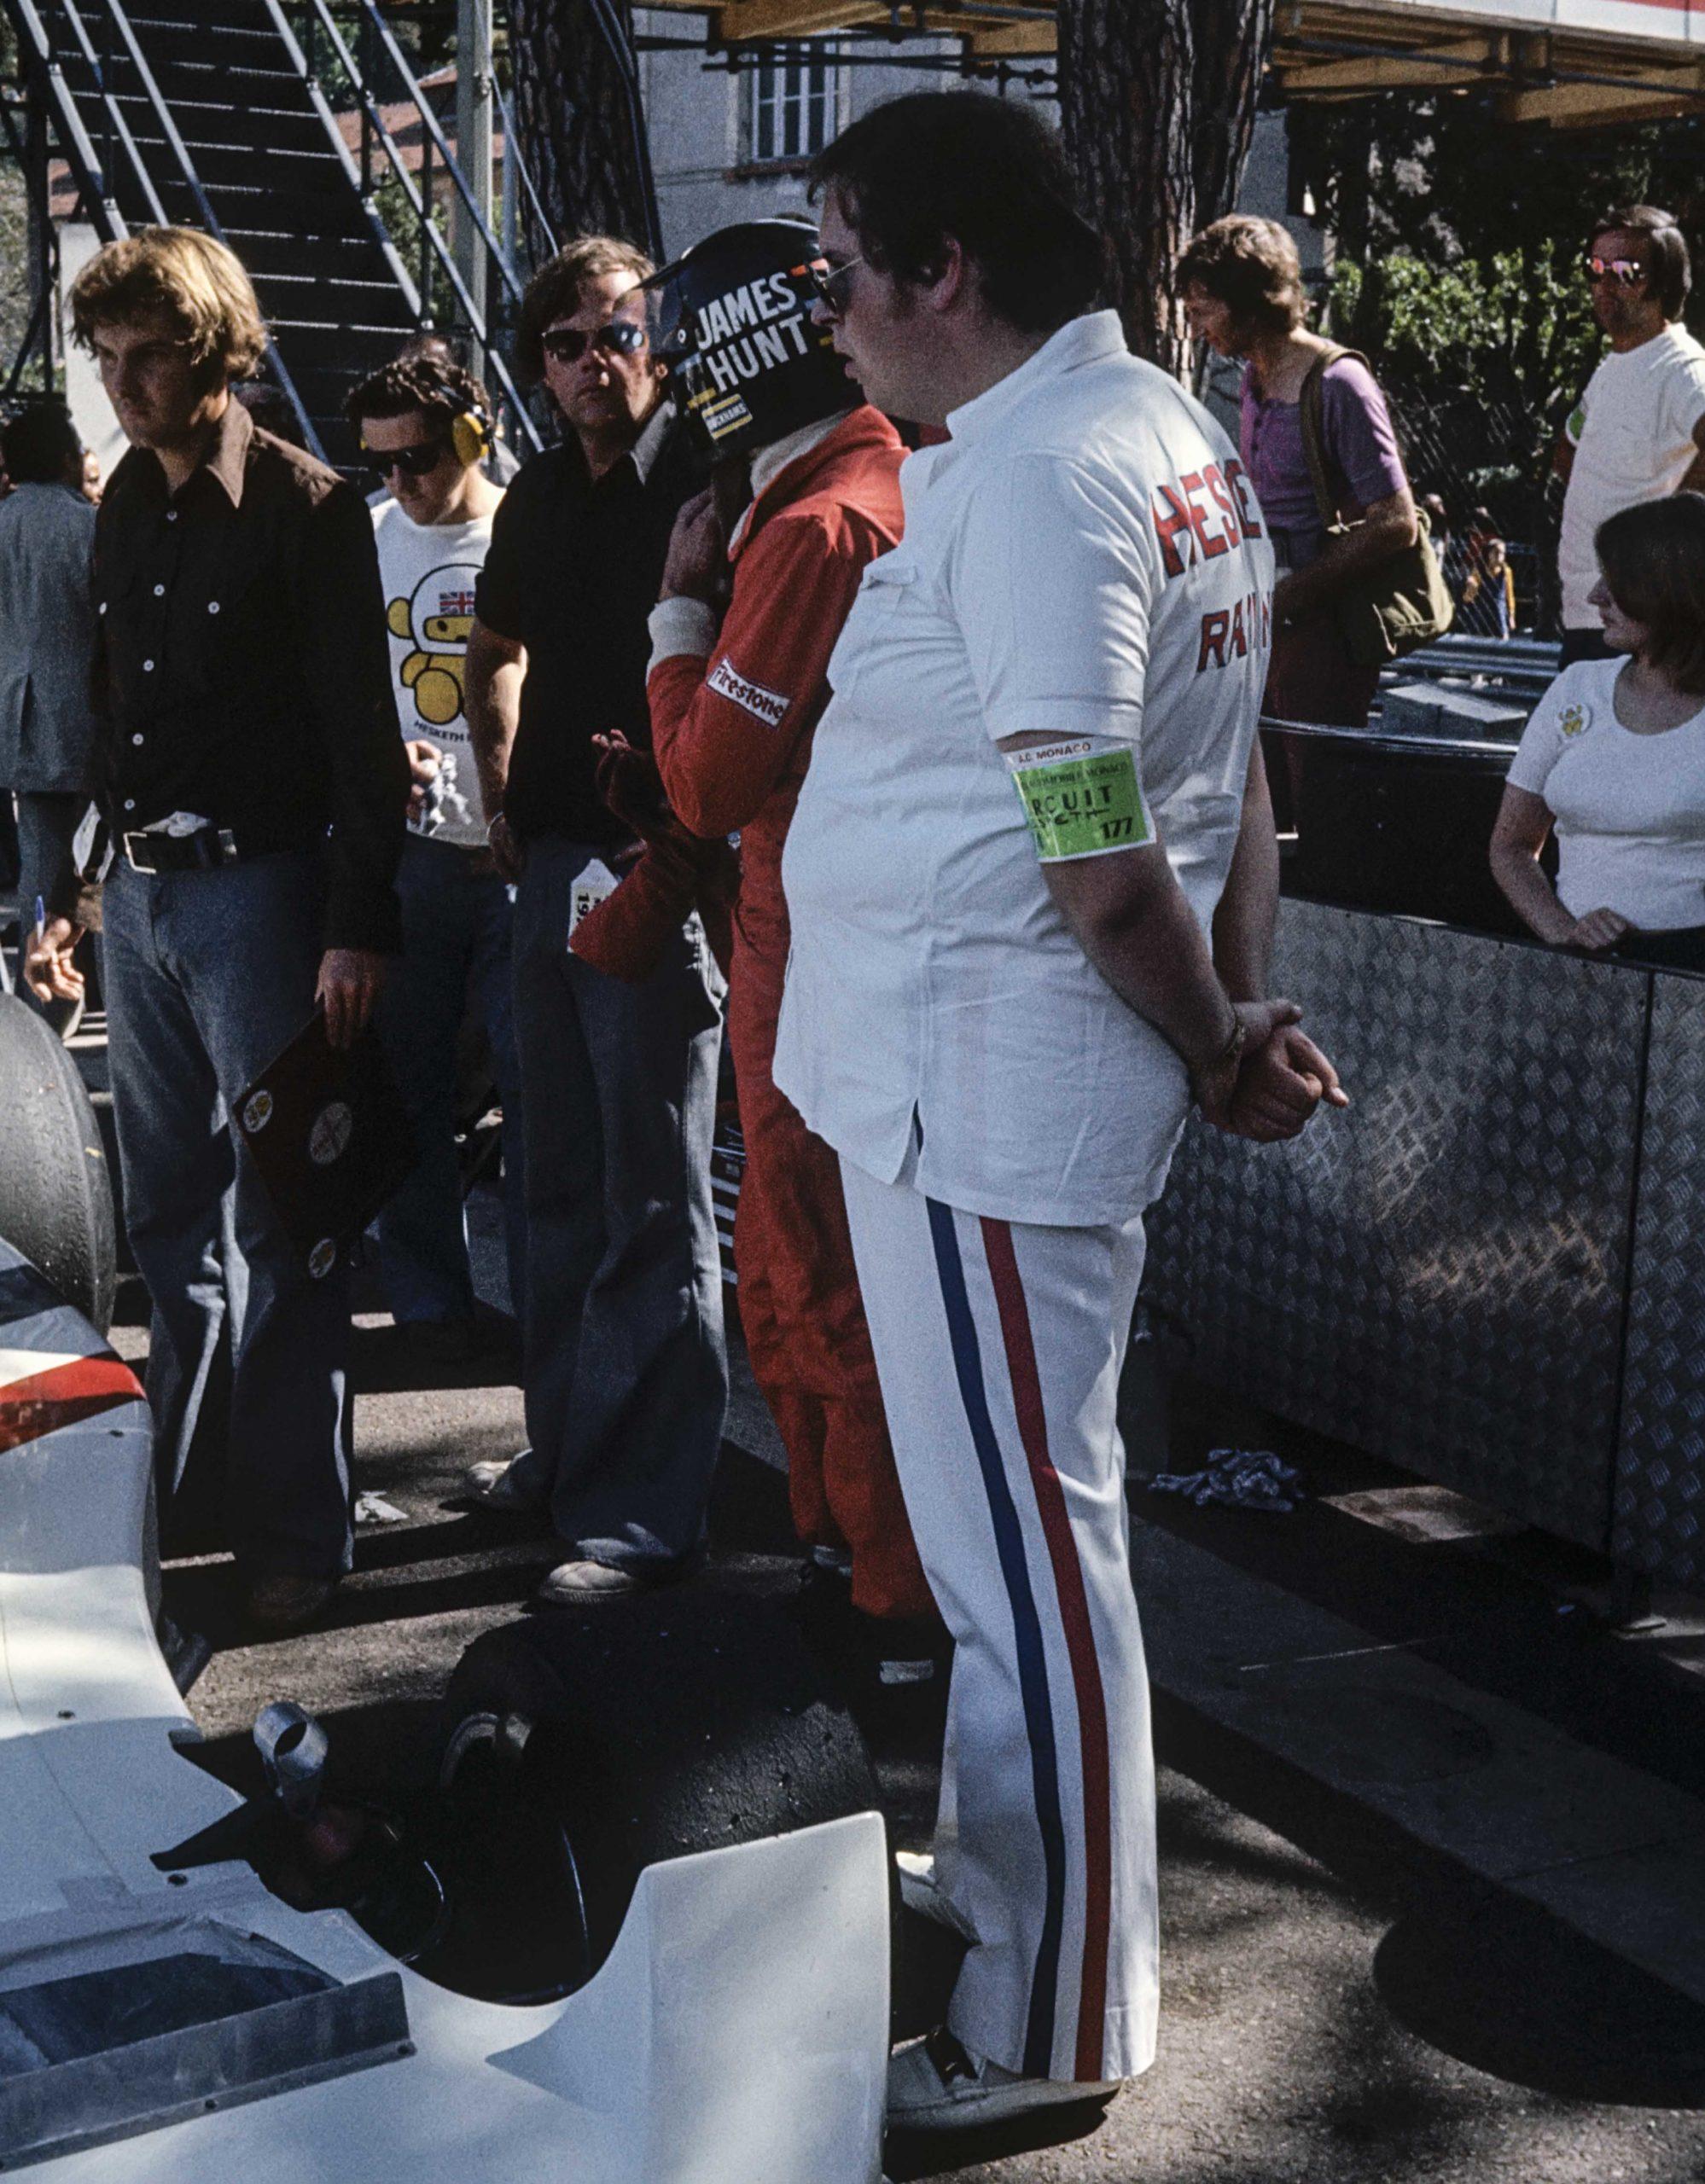 James Hunt, Lord Hesketh, Harvey Postlethwaite, Bubbles Horsley, Grand Prix Of Monaco